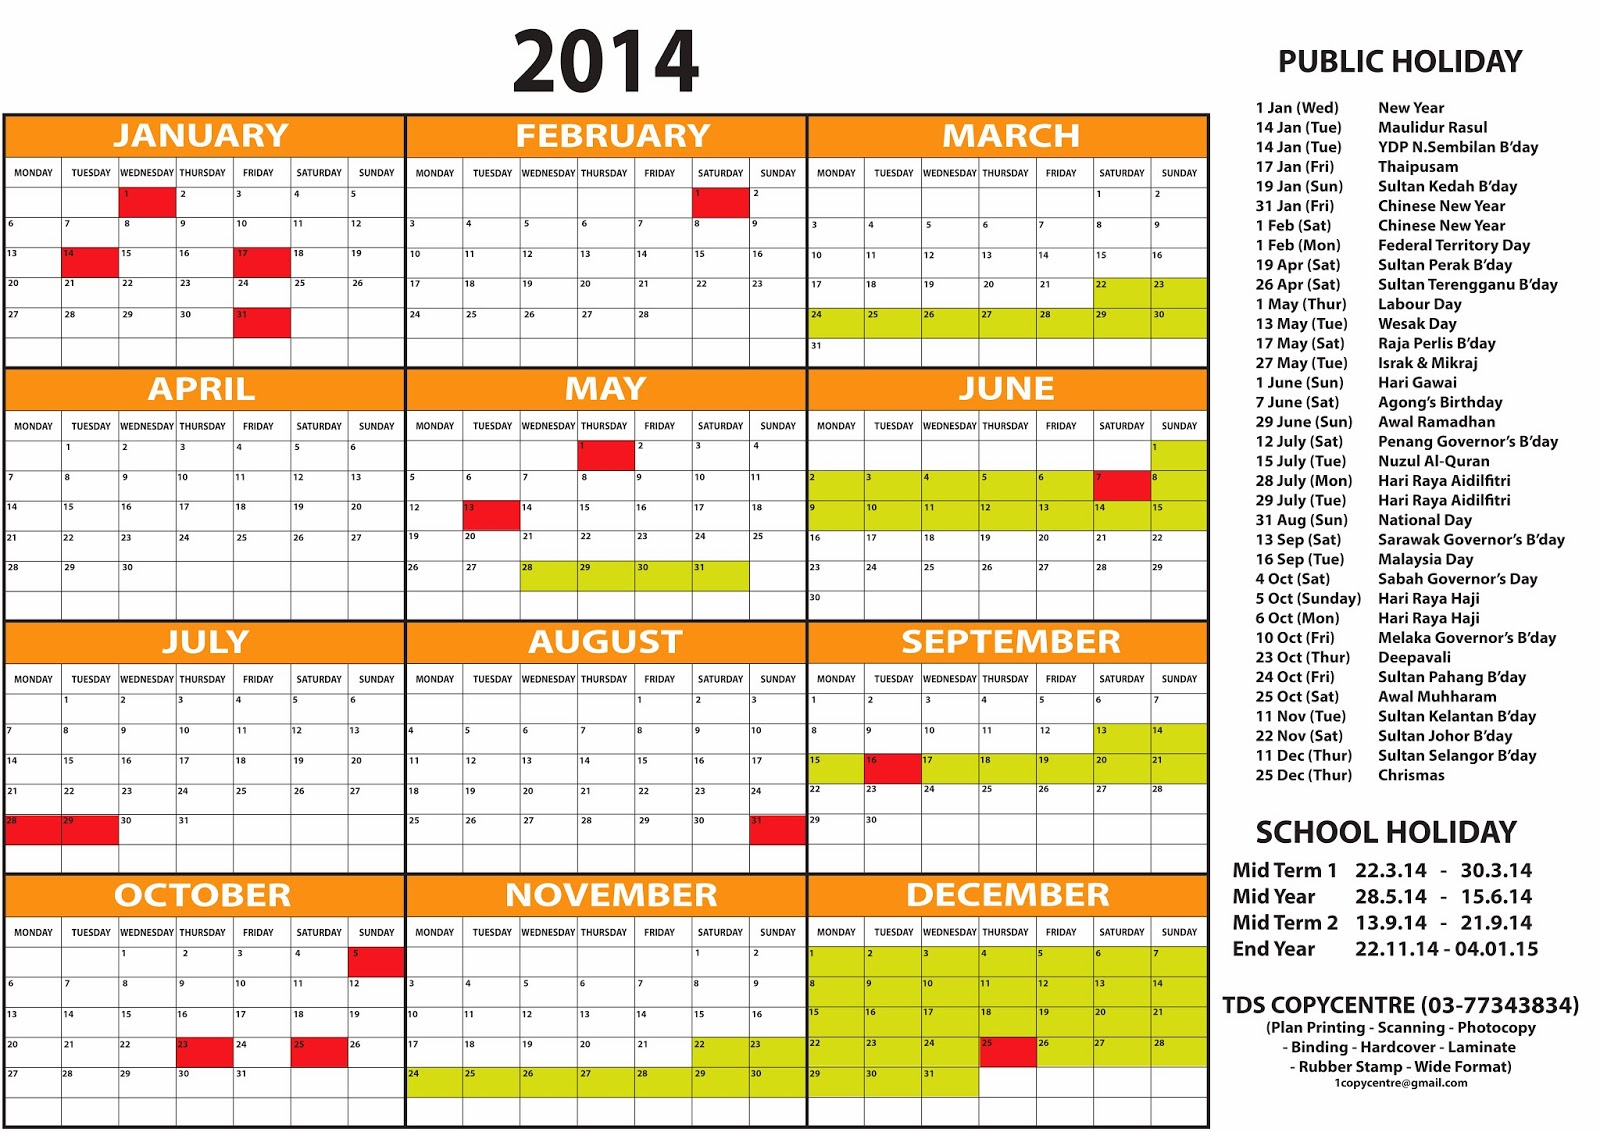 kalendar 2014 printable  2014 calendar printable  2014 planner  free